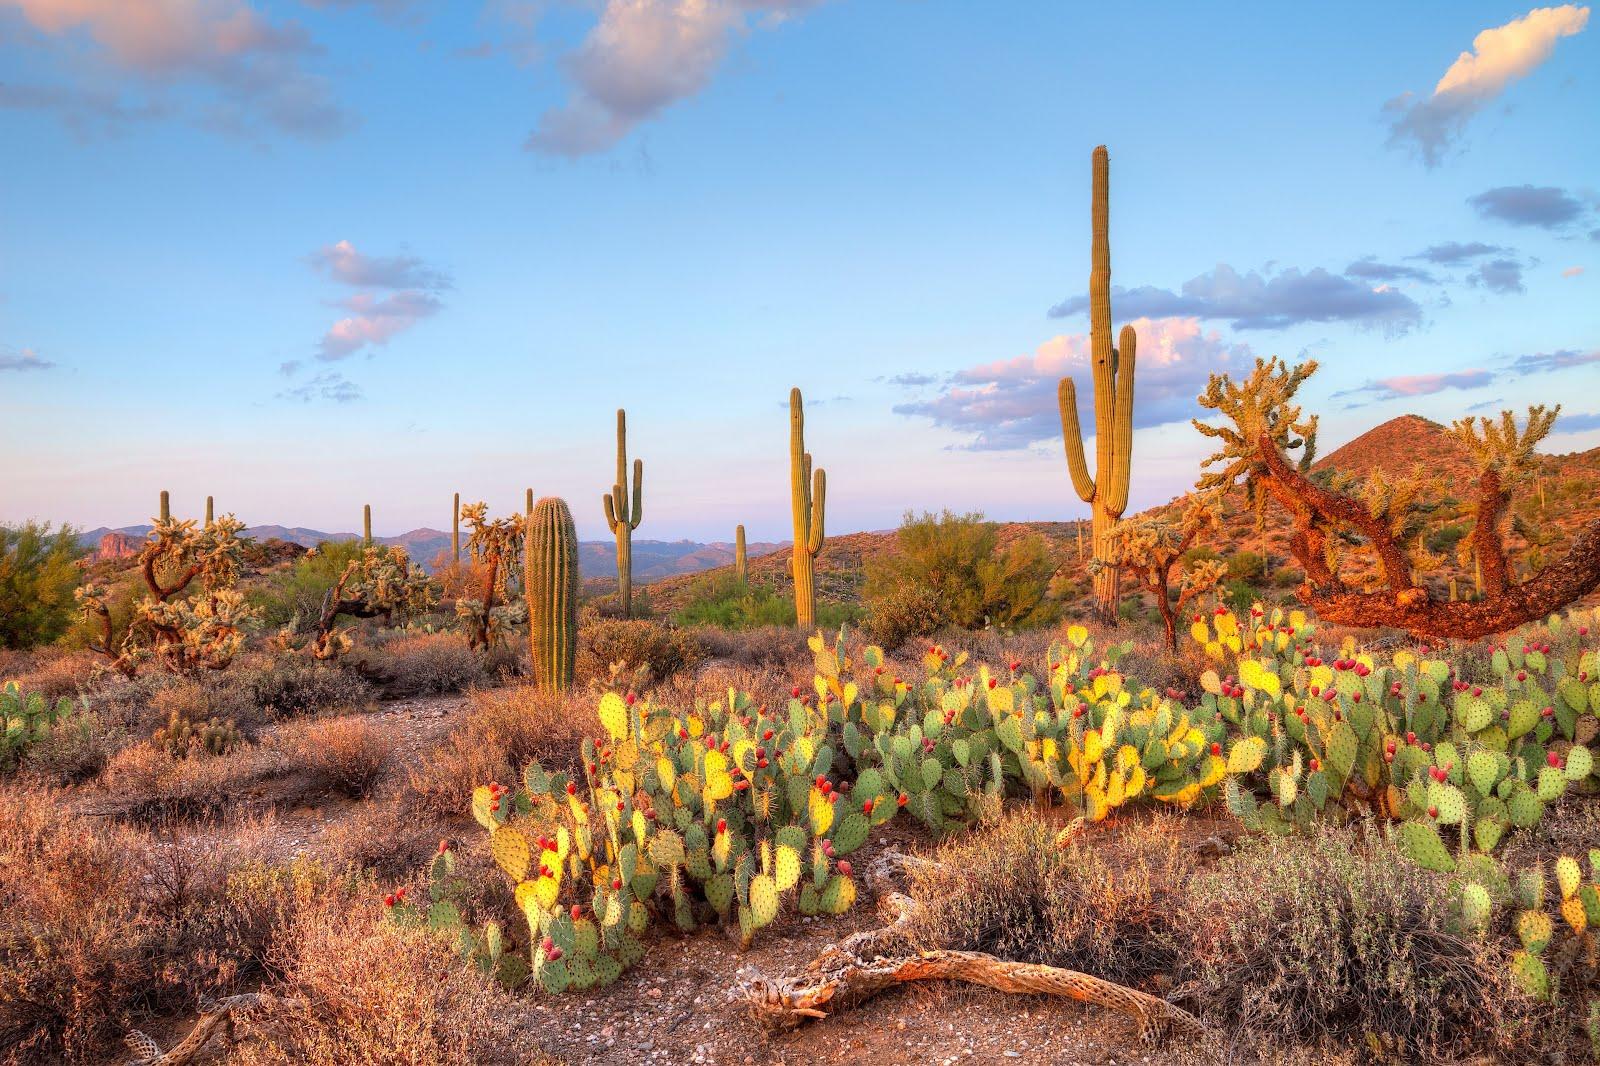 http://2.bp.blogspot.com/-KtsQ-vAe0Hk/T80dAqGUEzI/AAAAAAAA6do/l0RyAzyHzbU/s1600/paisaje-desierto-de-sonora-mexico-cactus-nopales.jpg